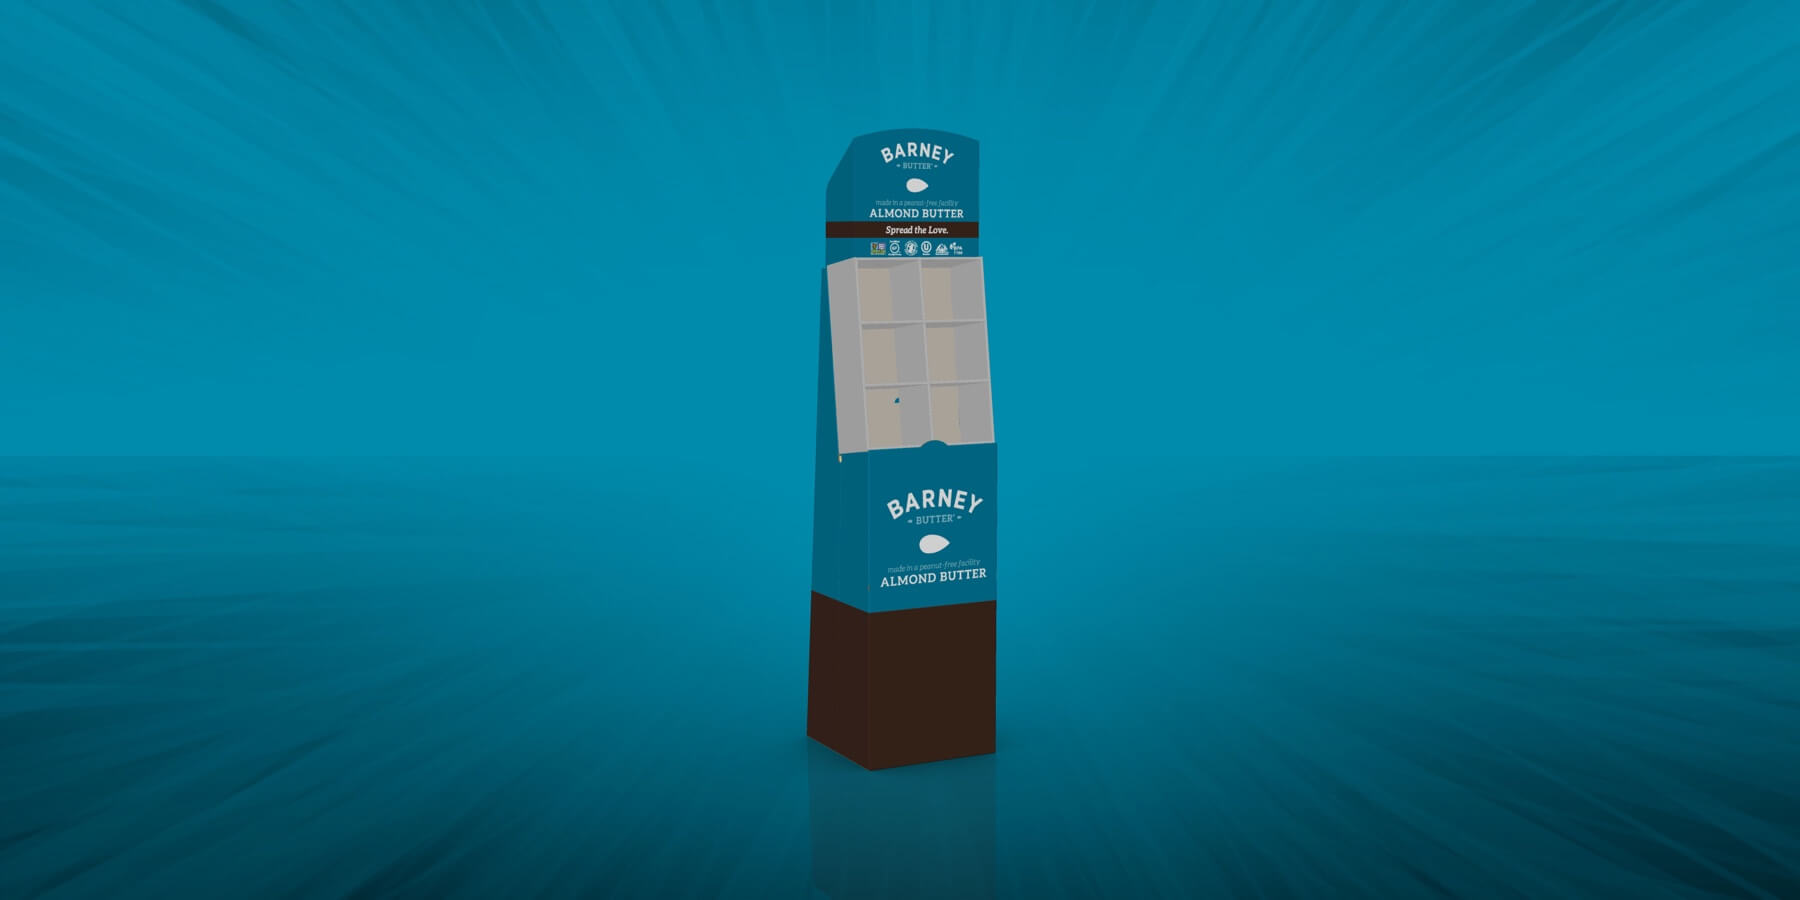 Spectrum Packaging Barney 3D Packaging on Teal Background